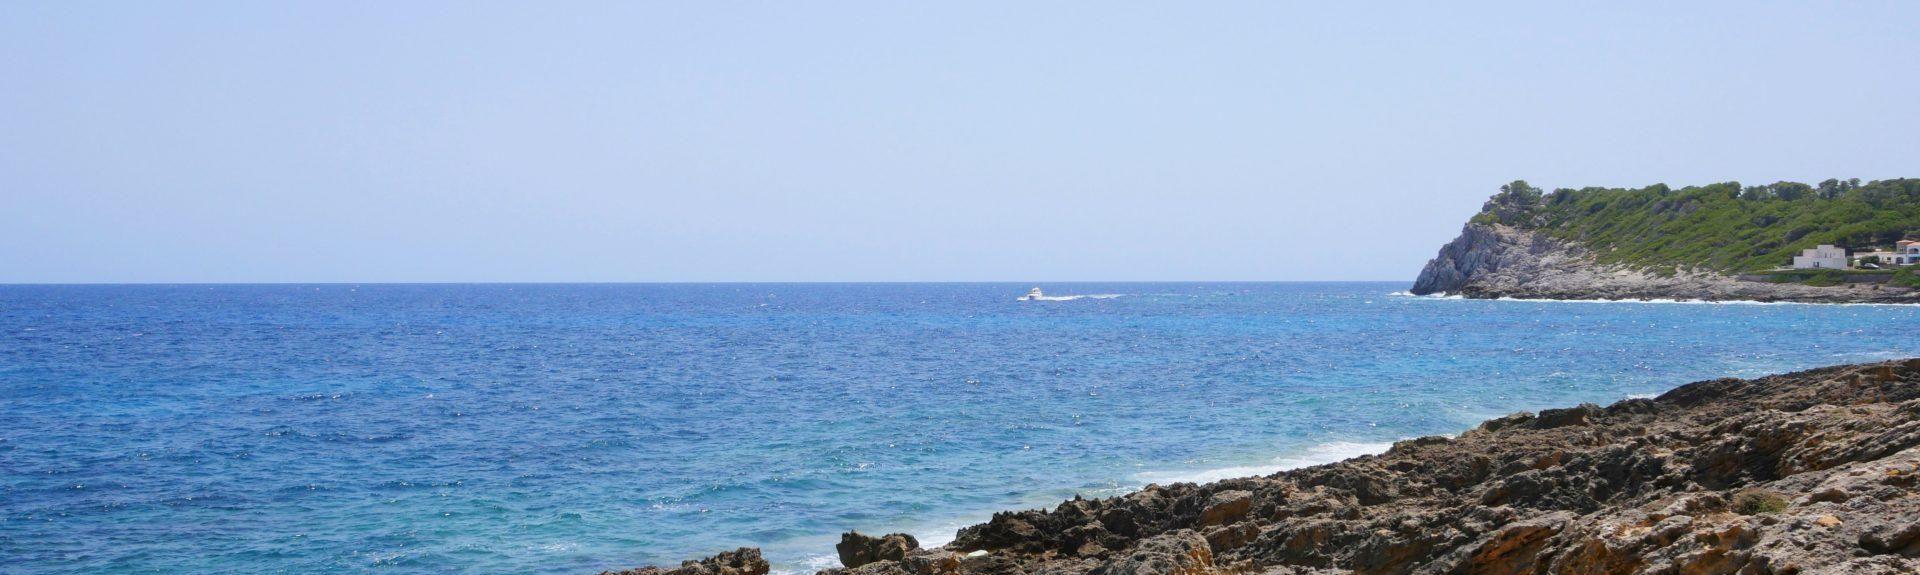 Son Moll, Capdepera, Balearic Islands, Spain